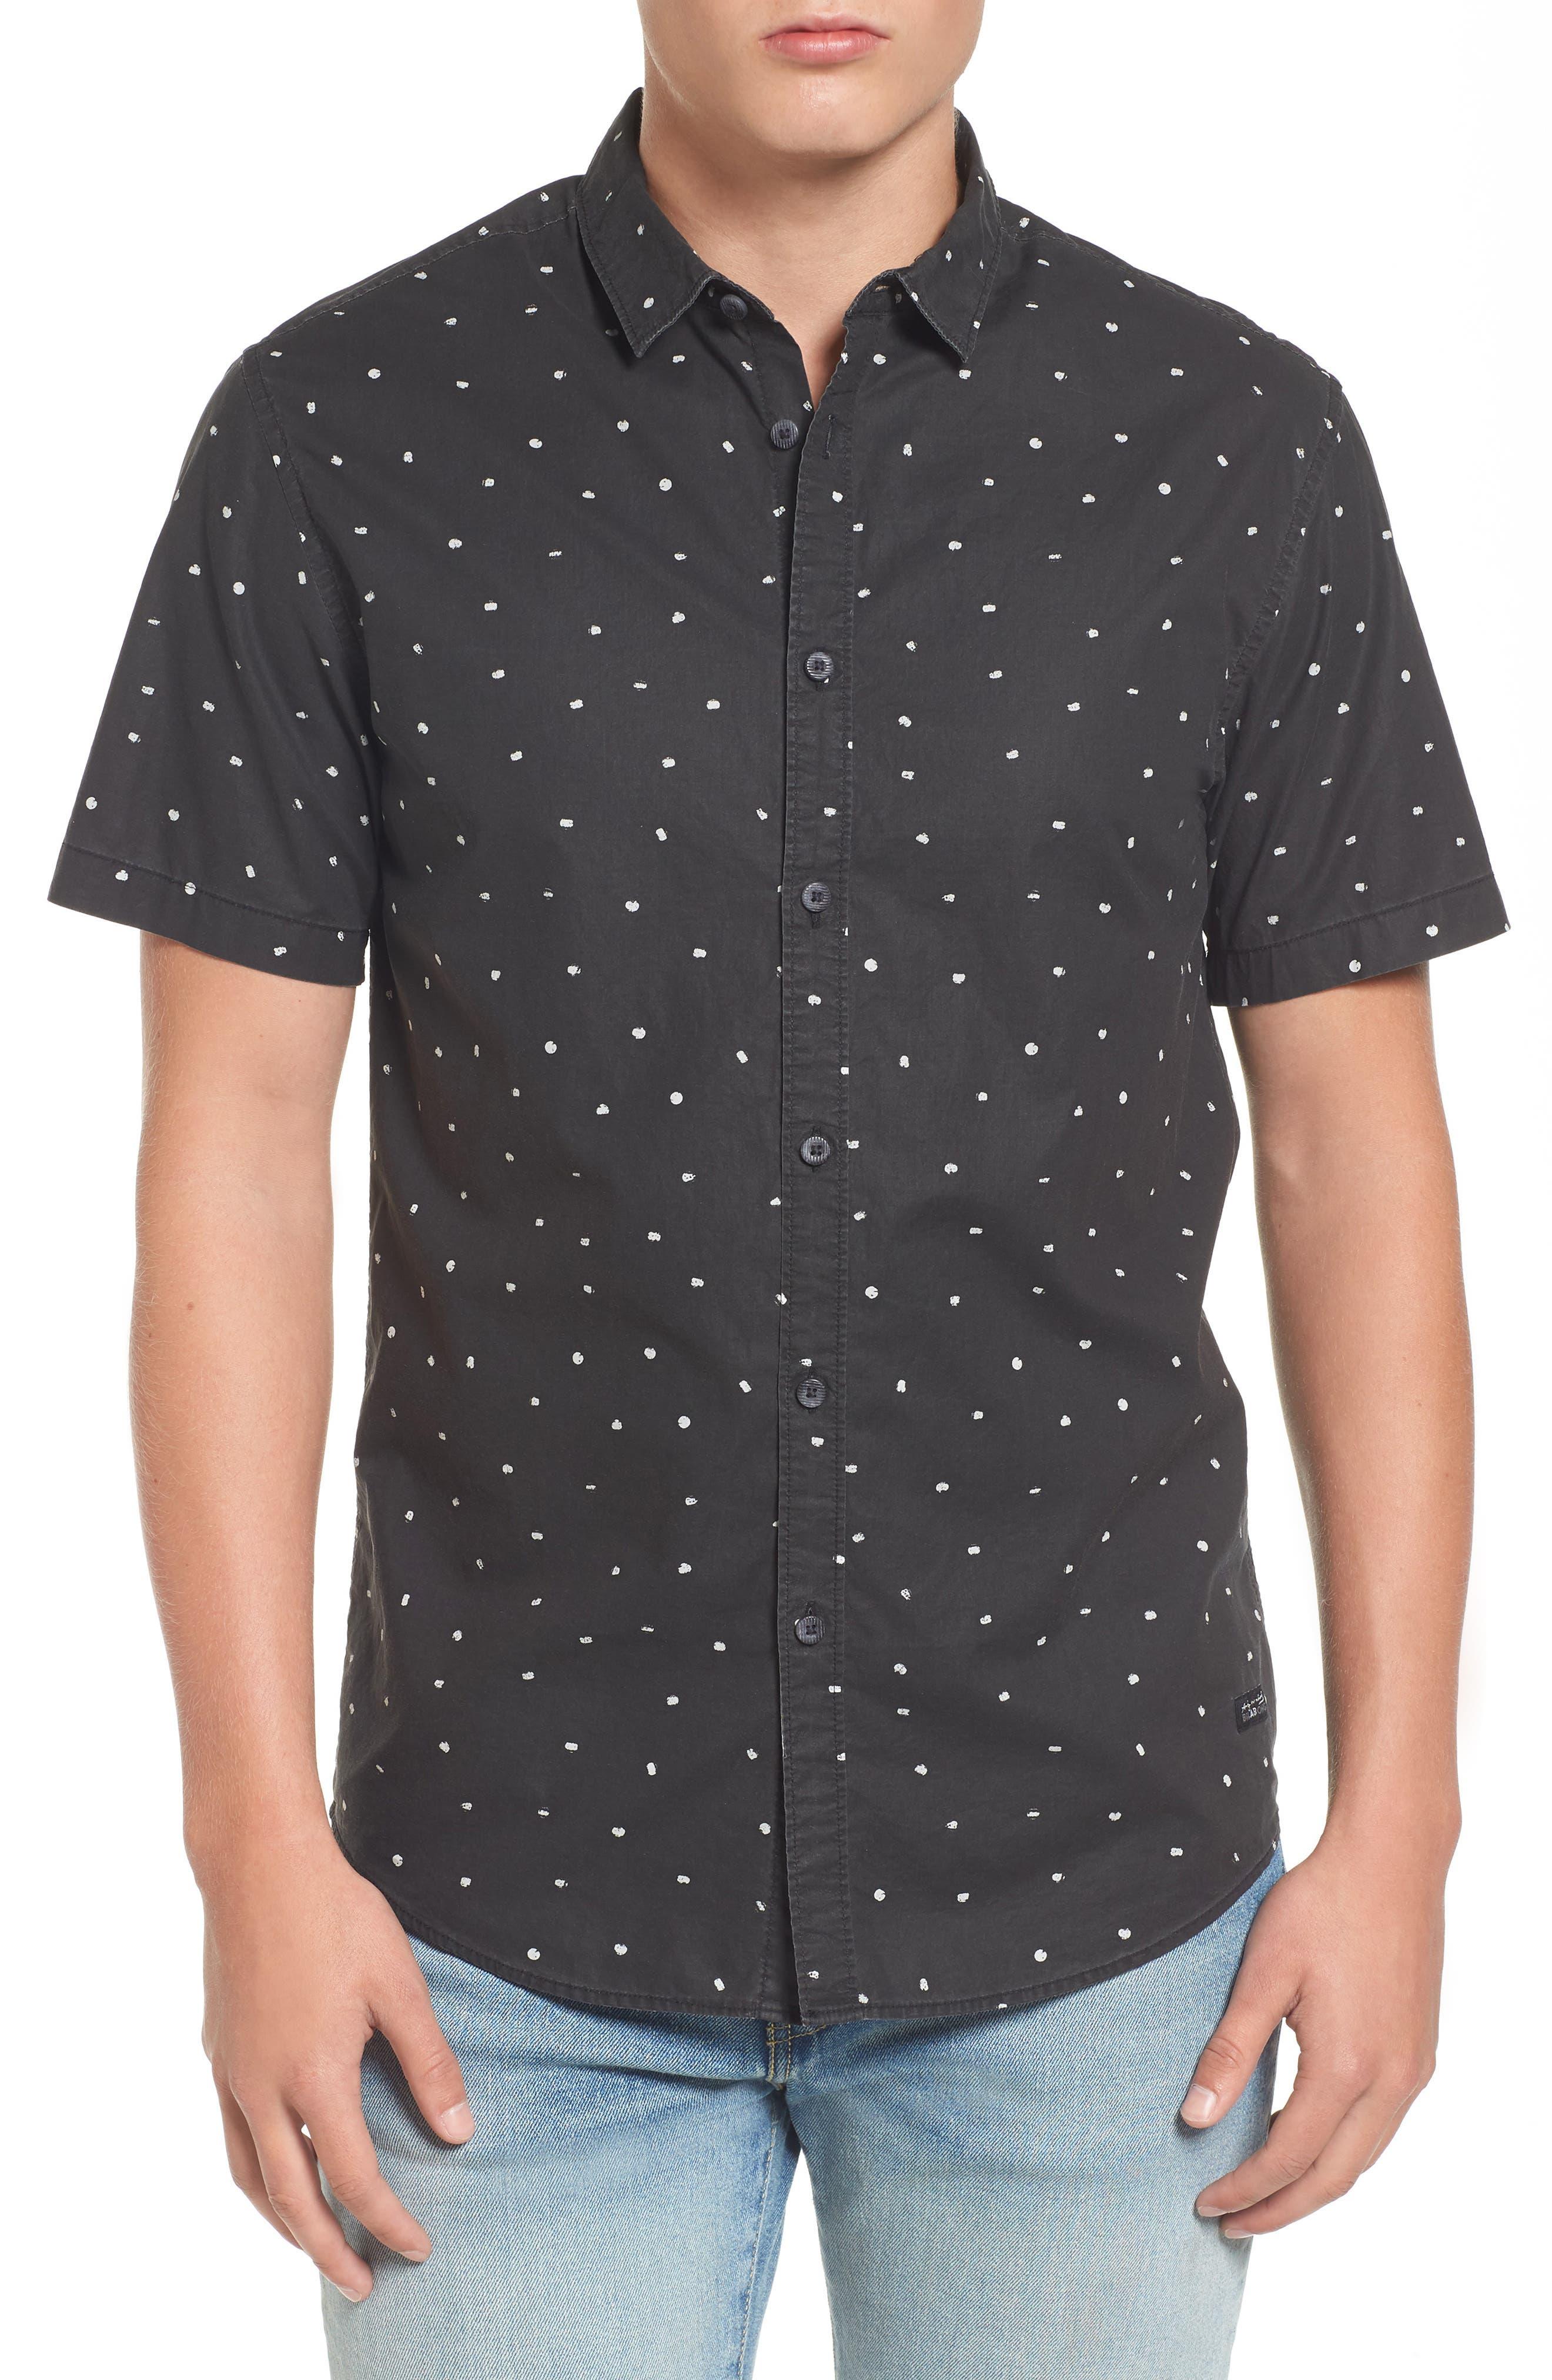 Main Image - Billabong x Warhol Print Woven Cotton Shirt